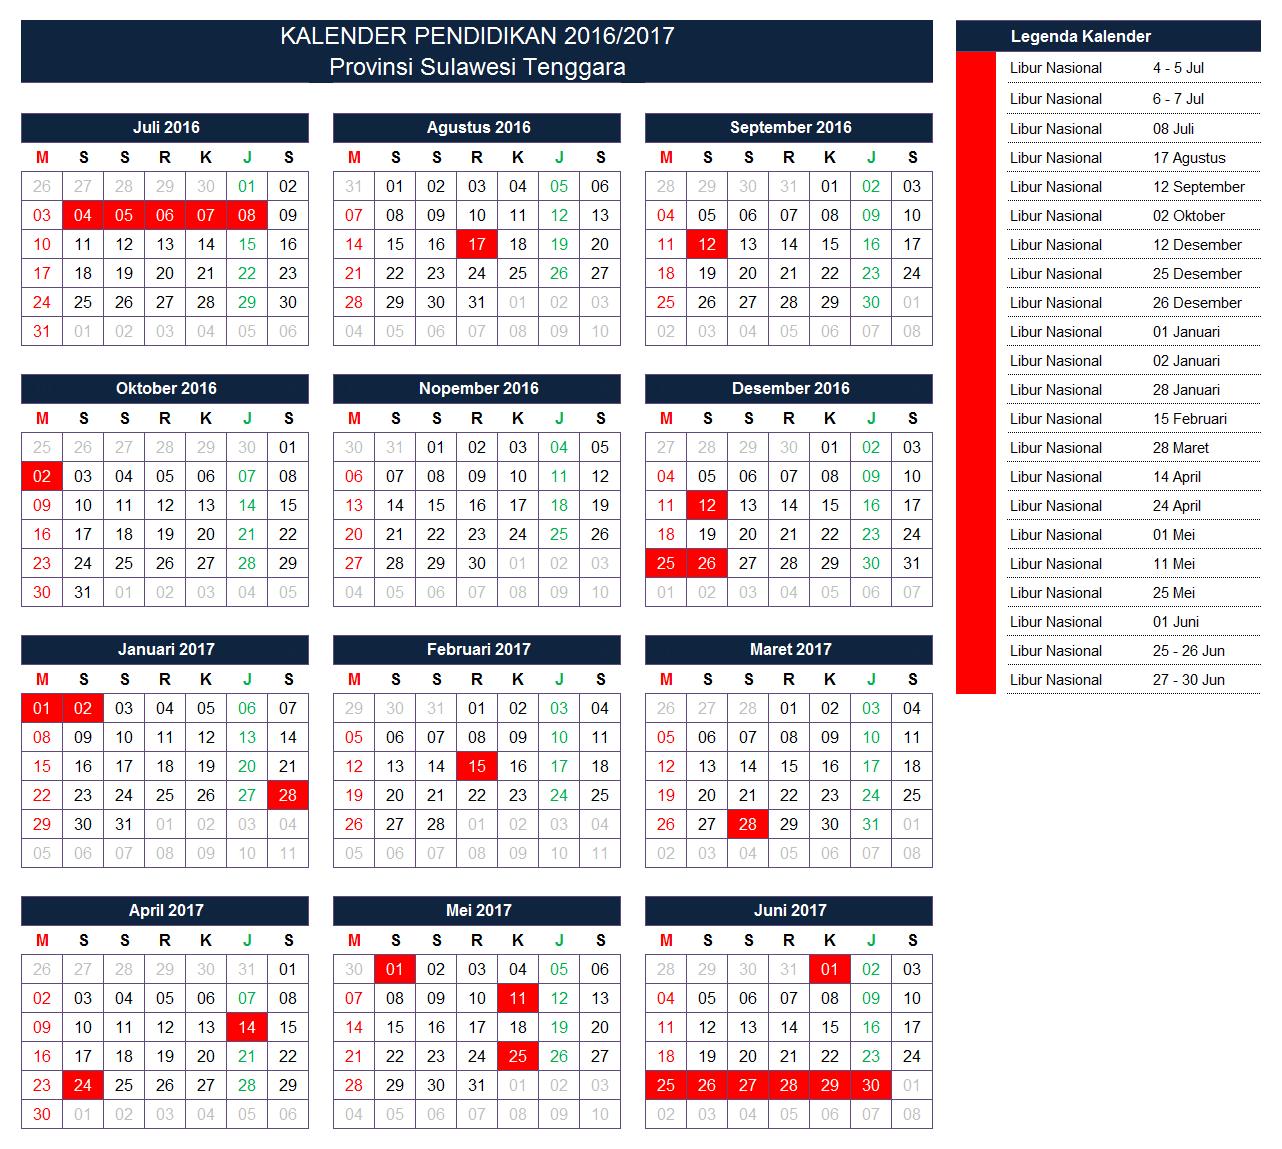 Kalender Pendidikan Provinsi Sulawesi Tenggara